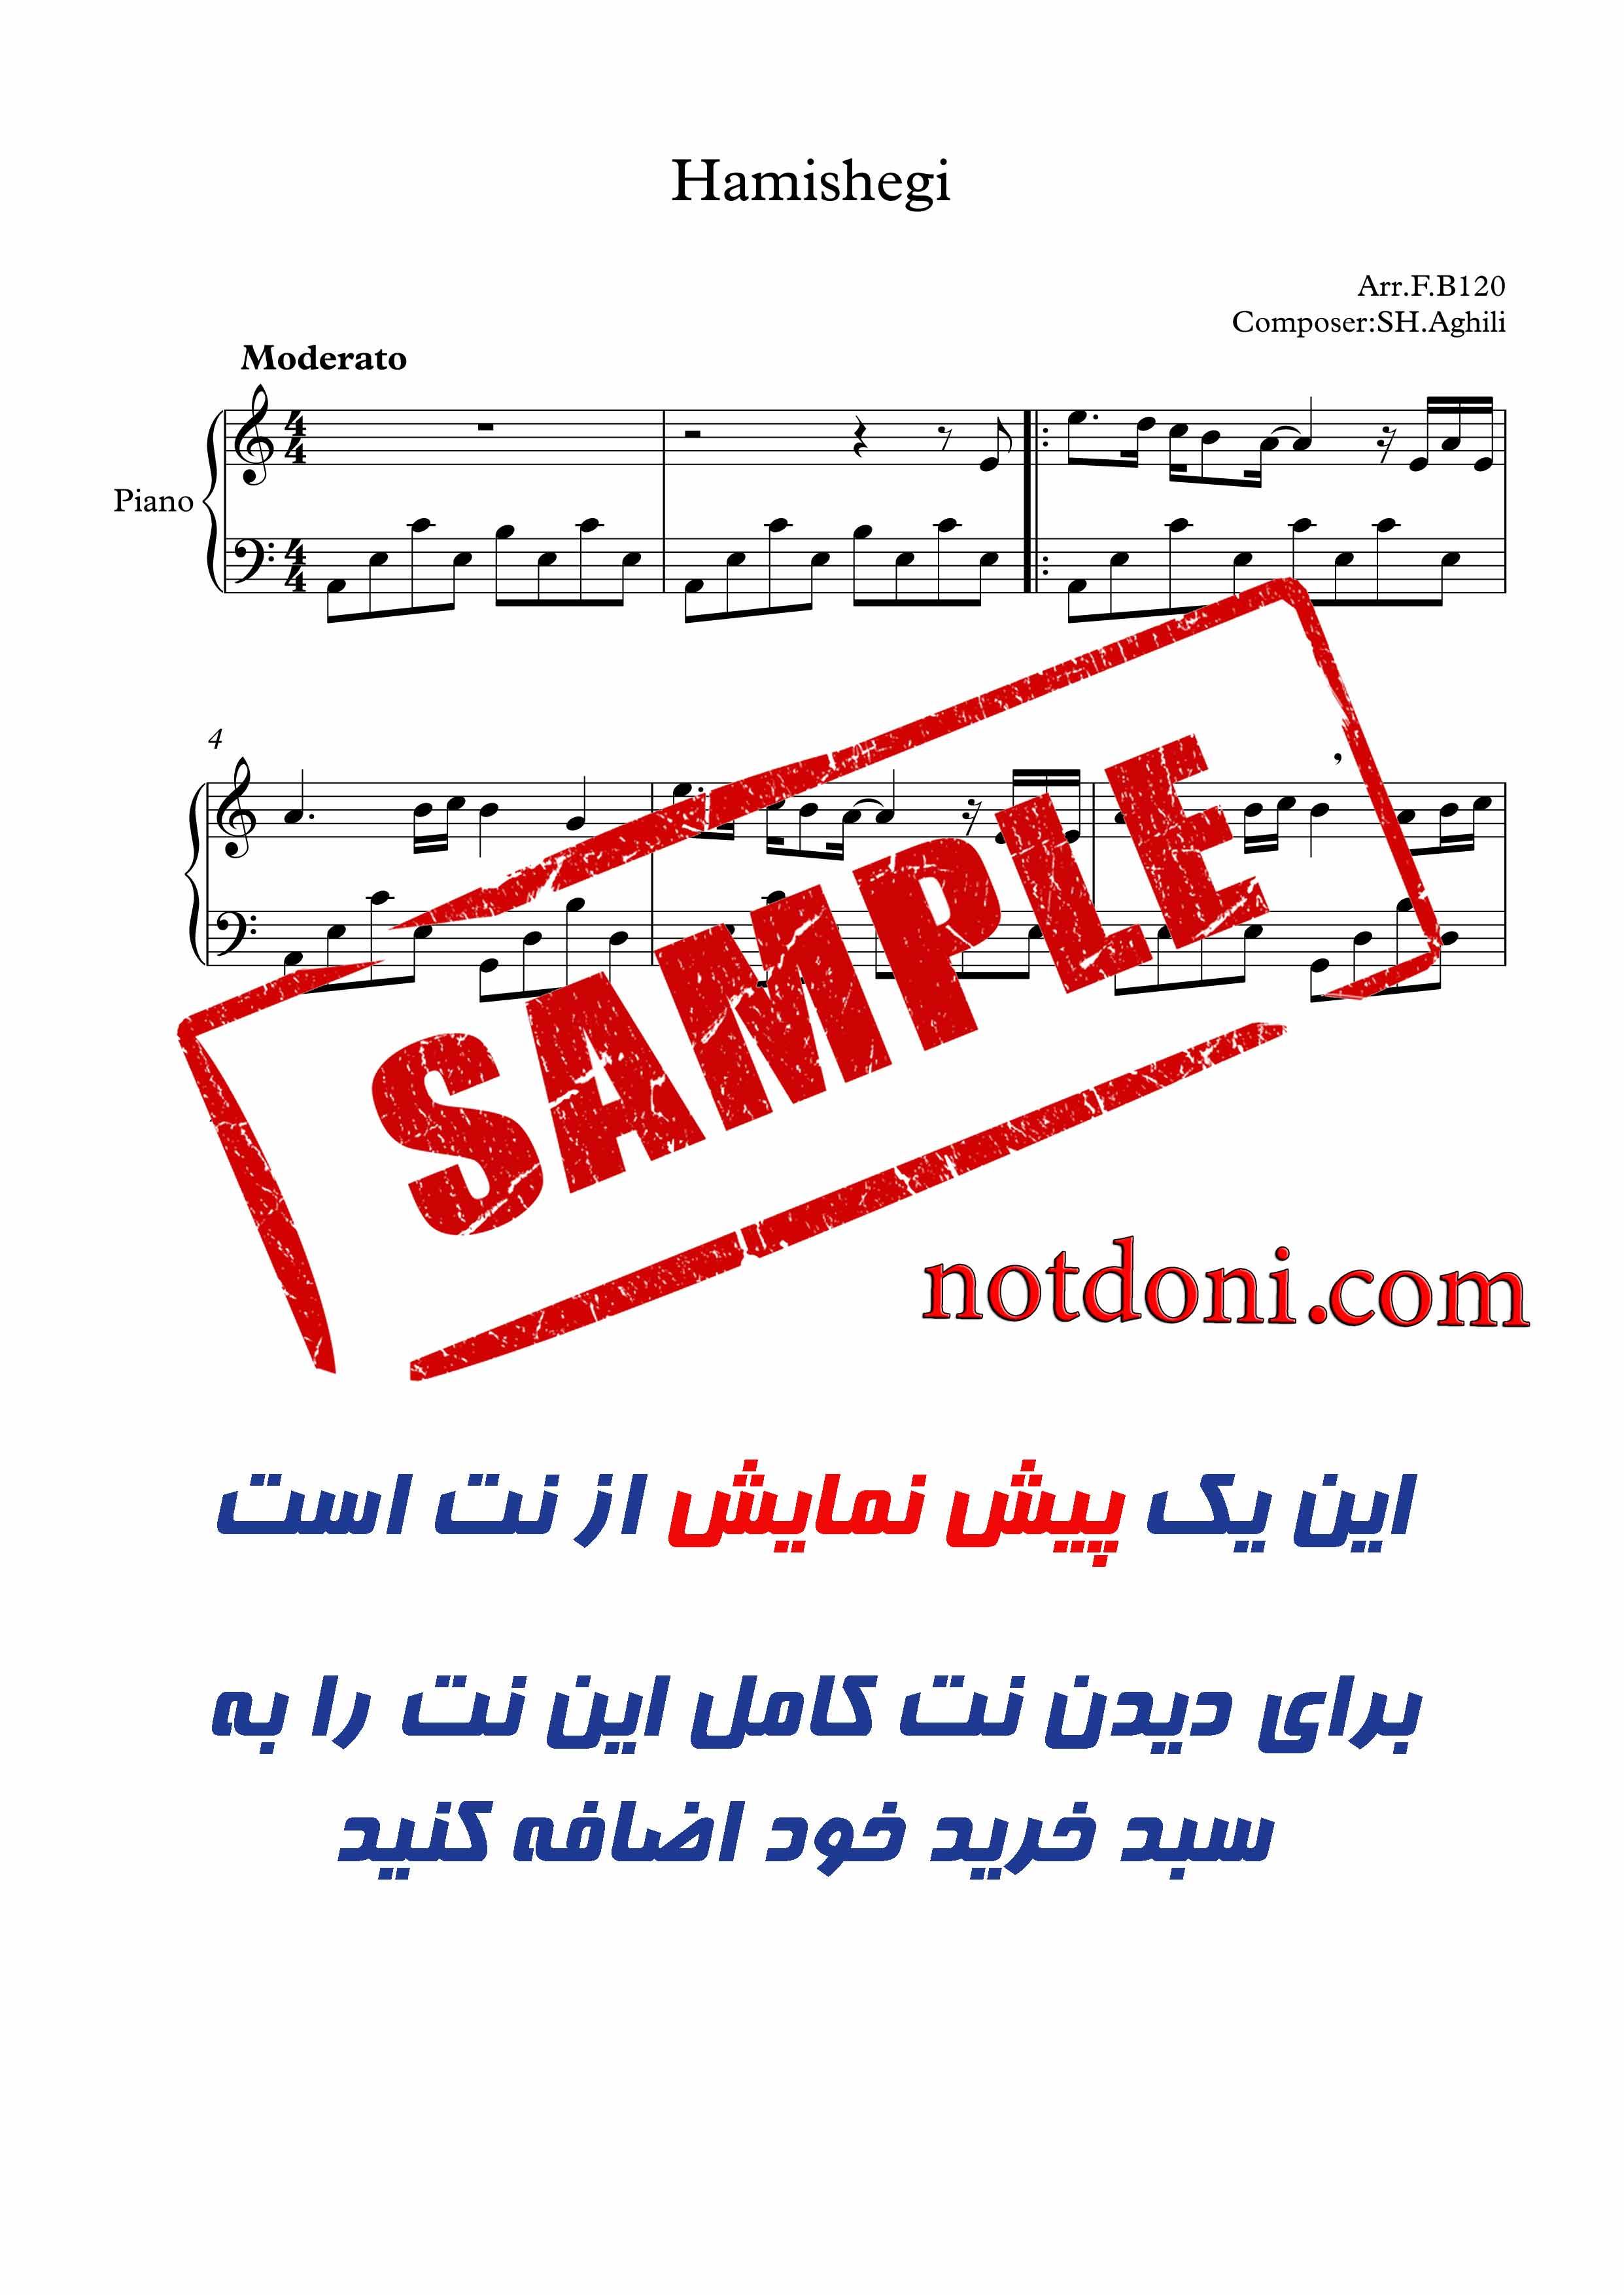 28df404b-5f39-4c16-a9bf-569e87c0bc5d_دموی-نت-آهنگ-همیشگی-پیانو.jpg